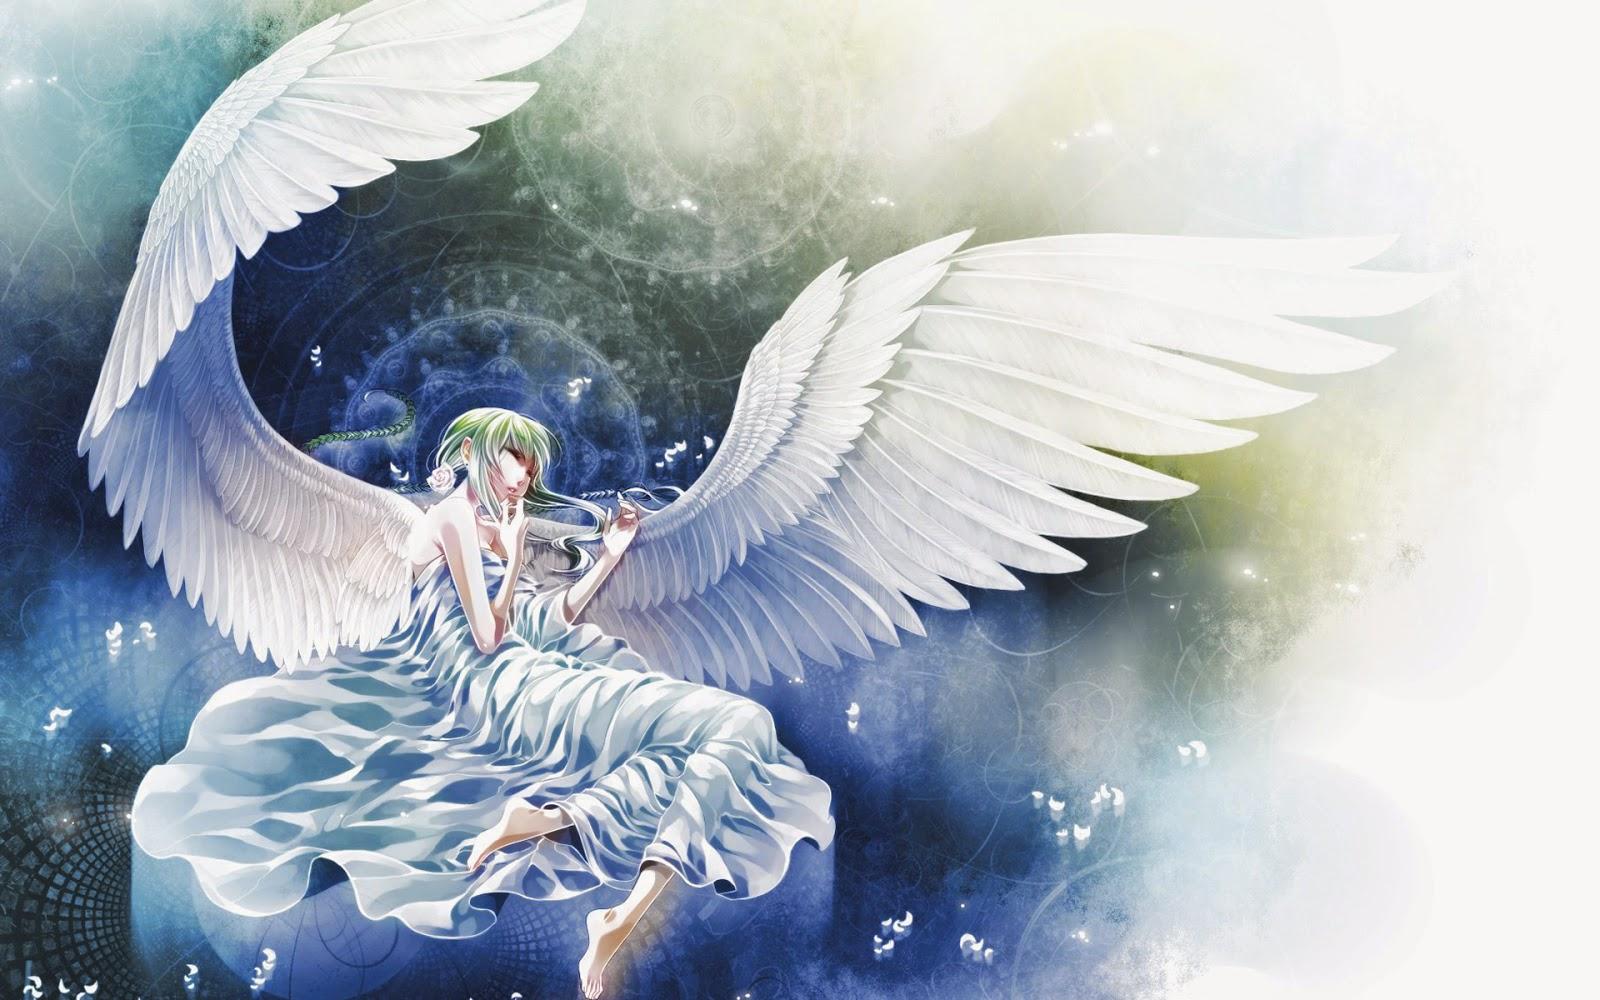 3d Cartoon Love Wallpaper Download Angel Wallpapers Beautiful Wallpapers Collection 2018